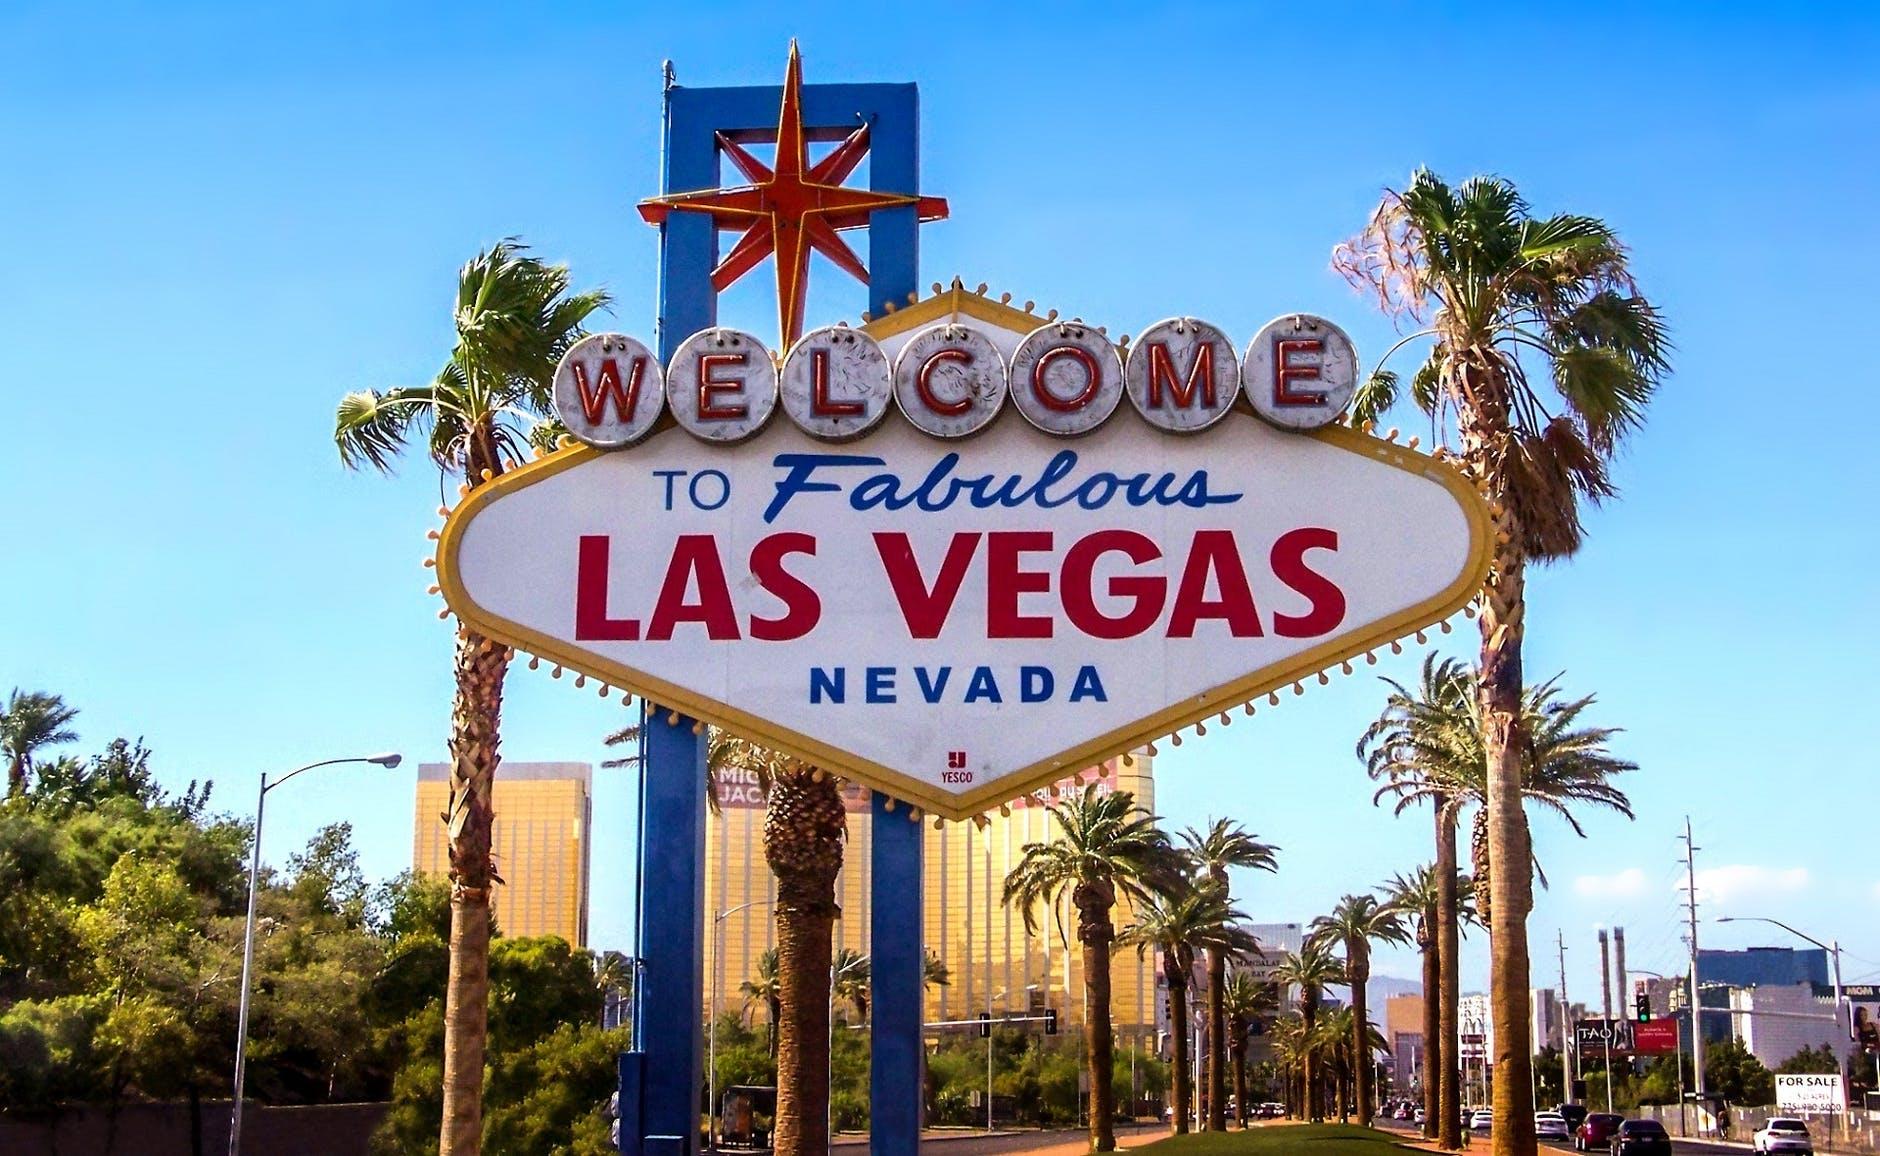 Travel Guide To Famous Las Vegas Sites photo